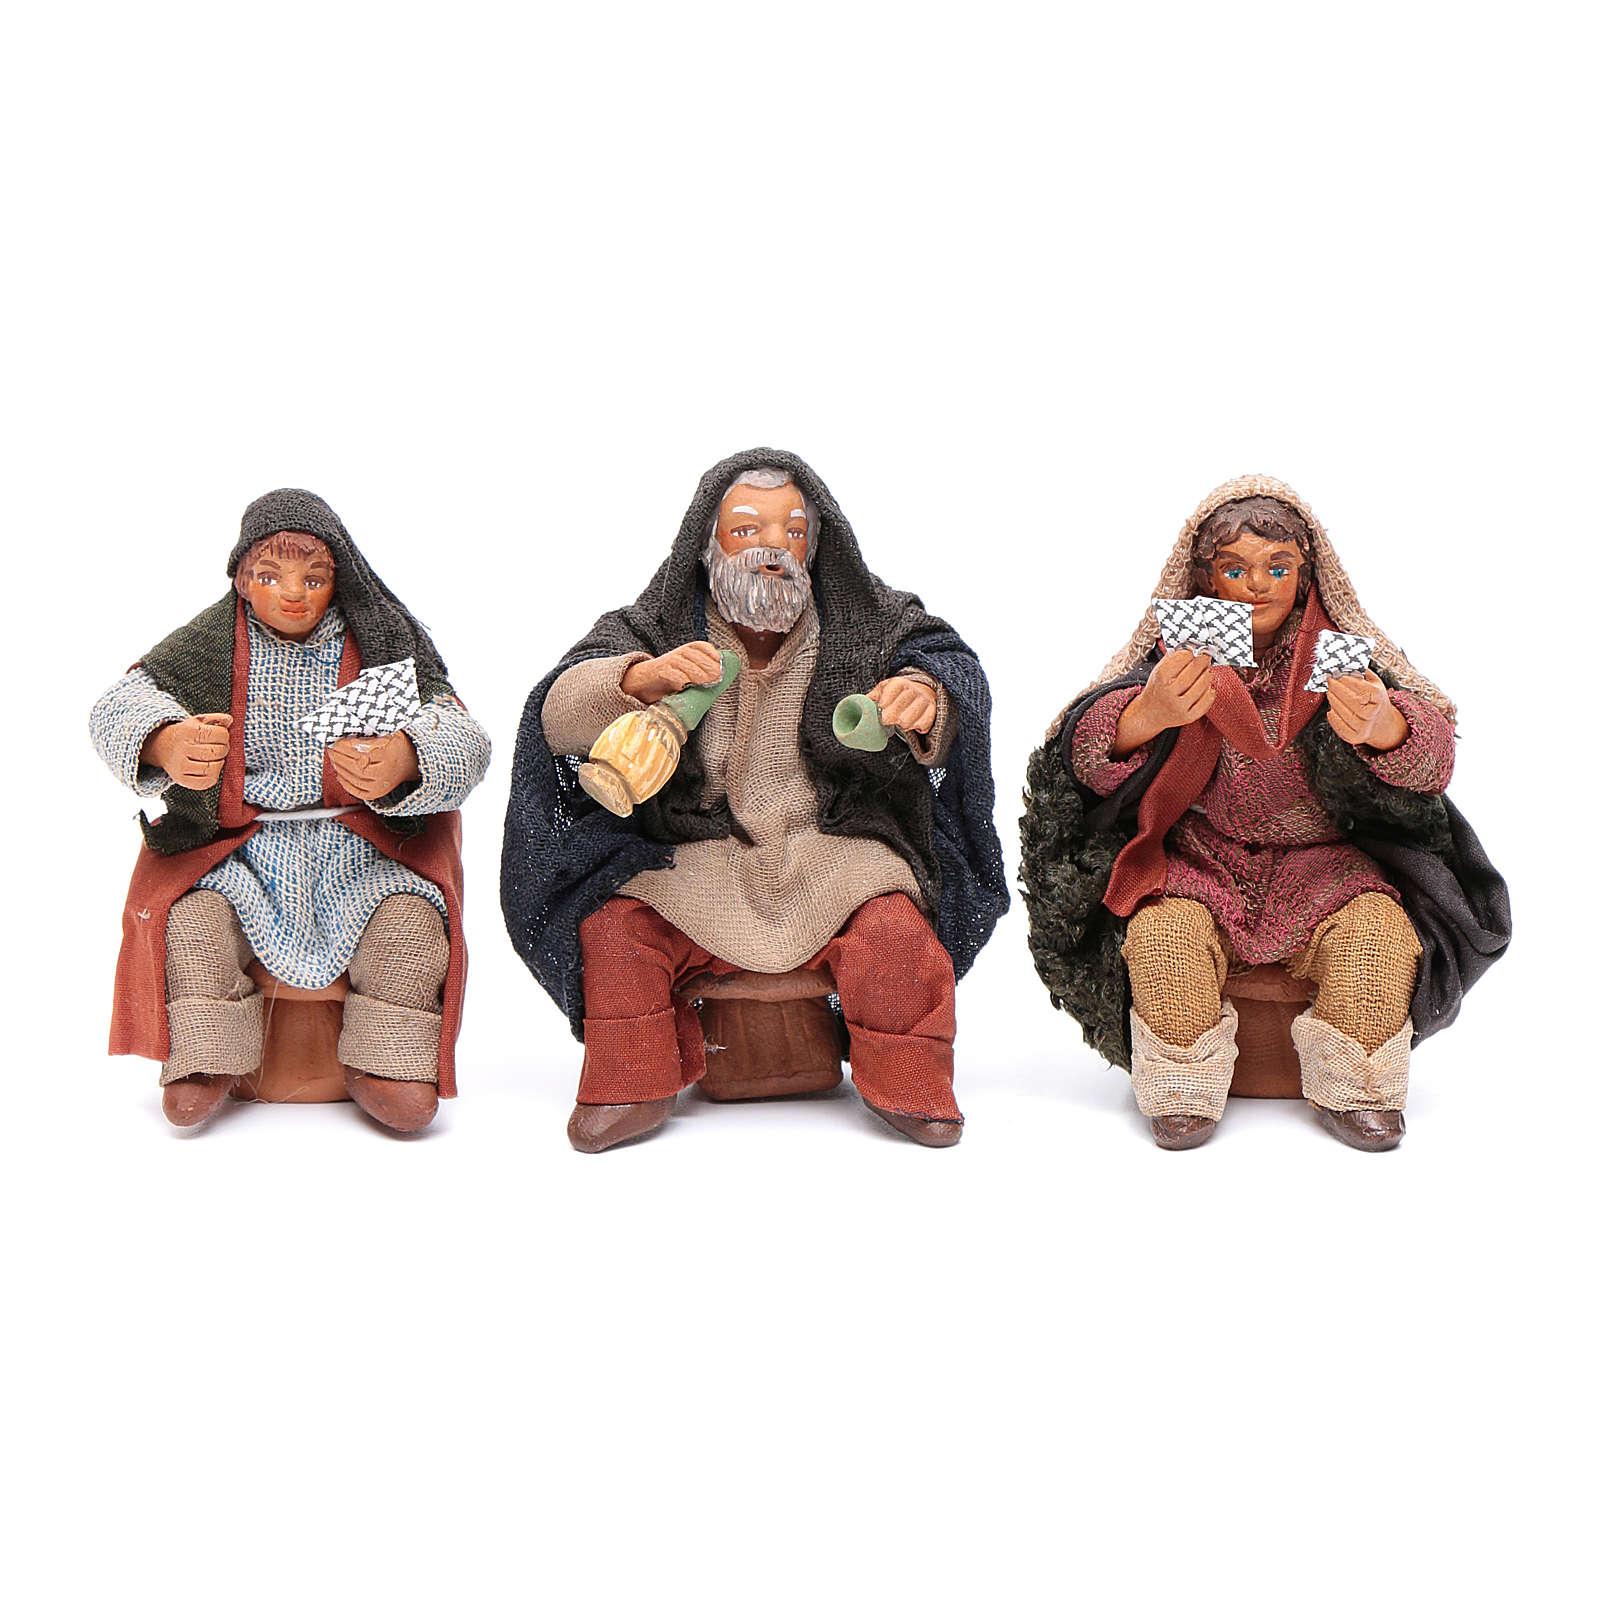 Set giocatori carte 3 personaggi 10 cm presepe Napoli 4